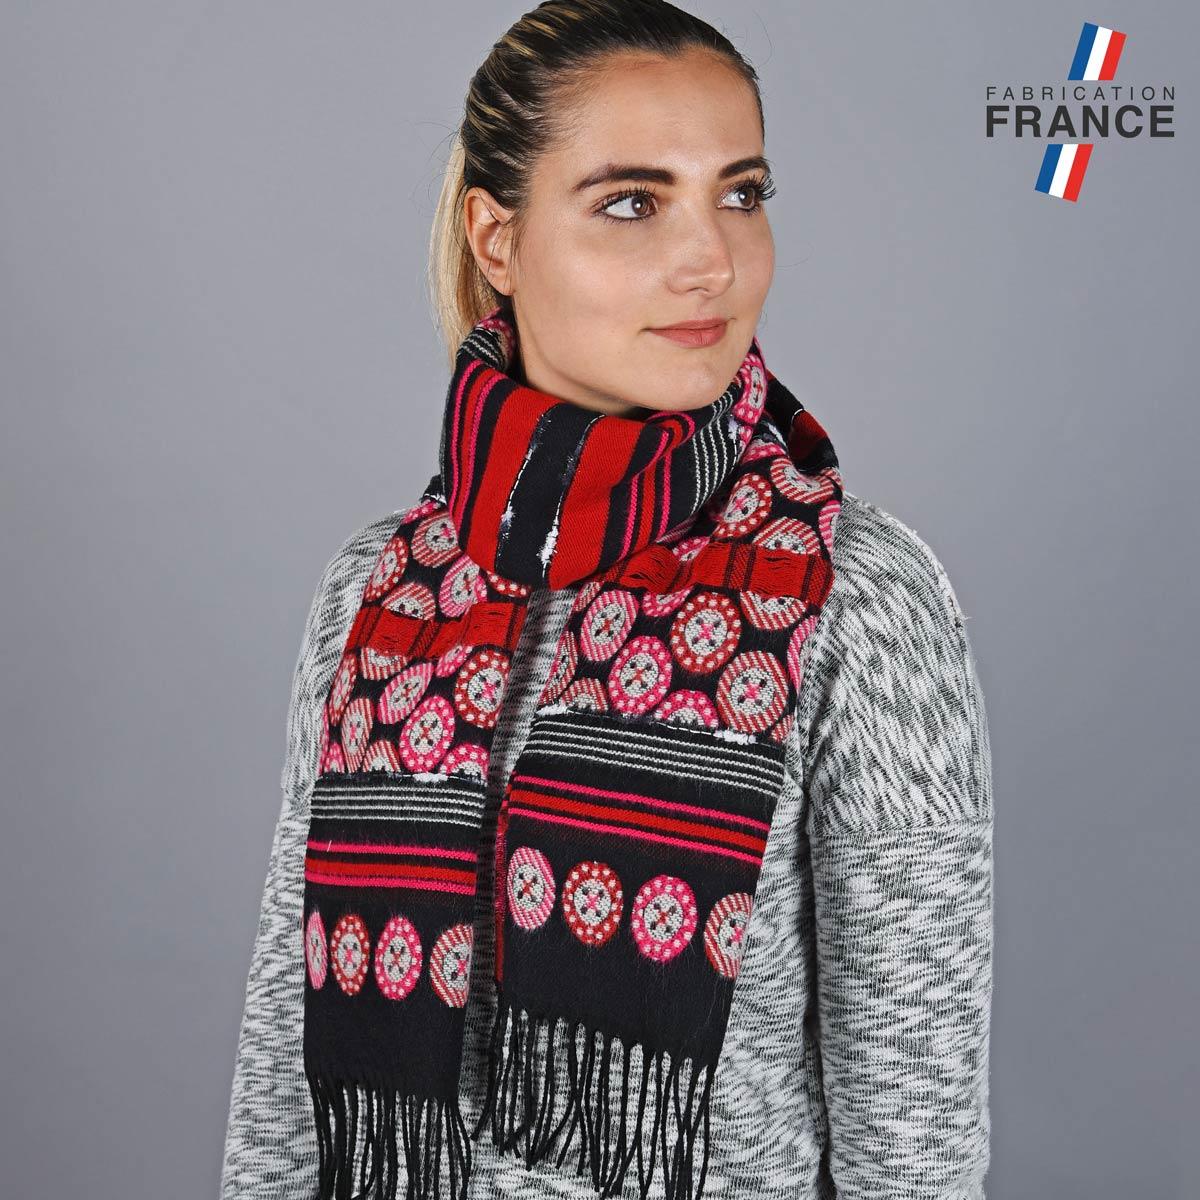 AT-05790_W12-1FR_Echarpe-femme-boutons-rouges-made-in-france